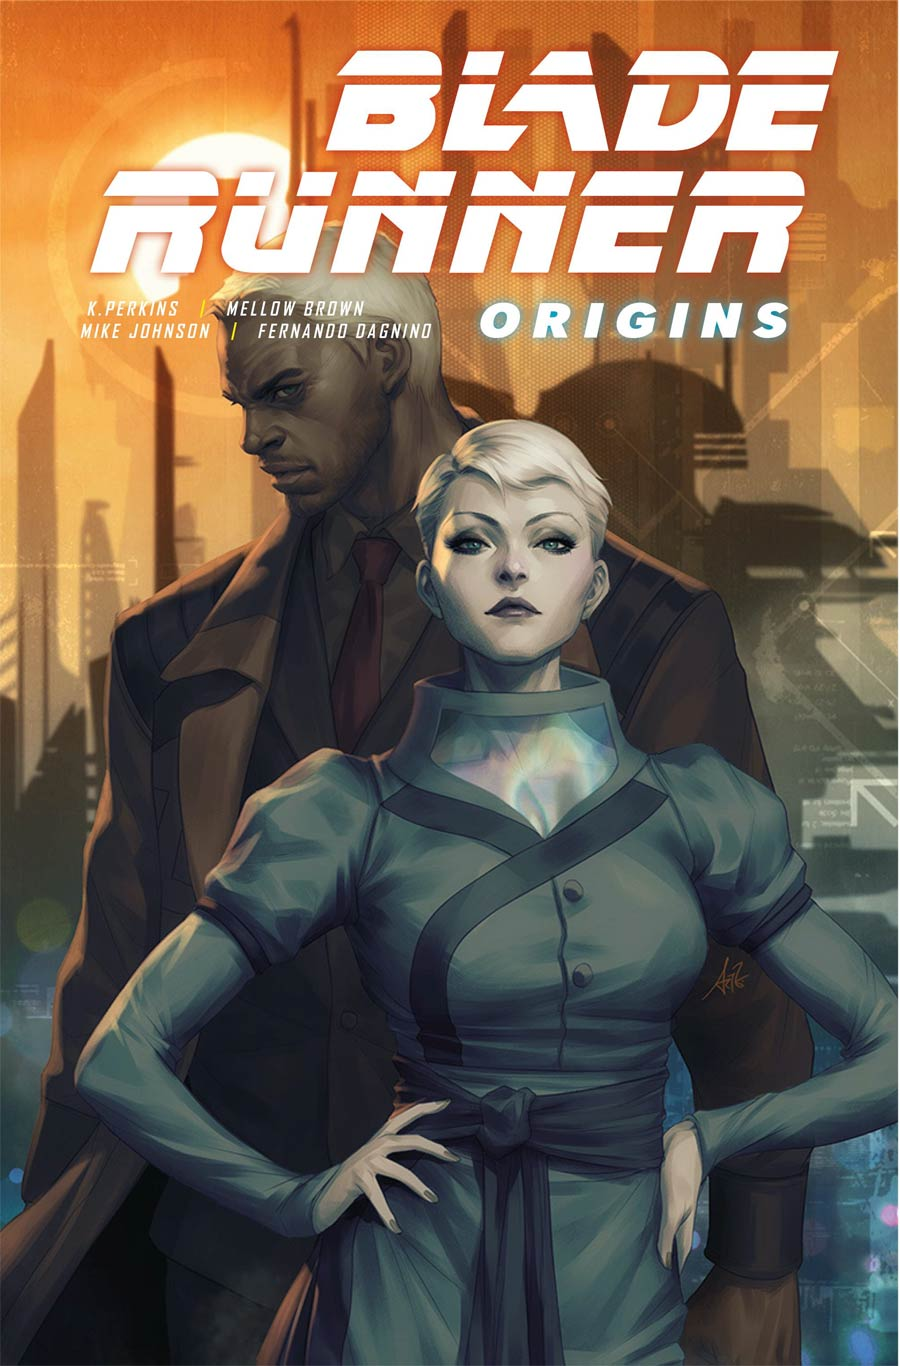 Blade Runner Origins #1 Cover A Regular Stanley Artgerm Lau Cover